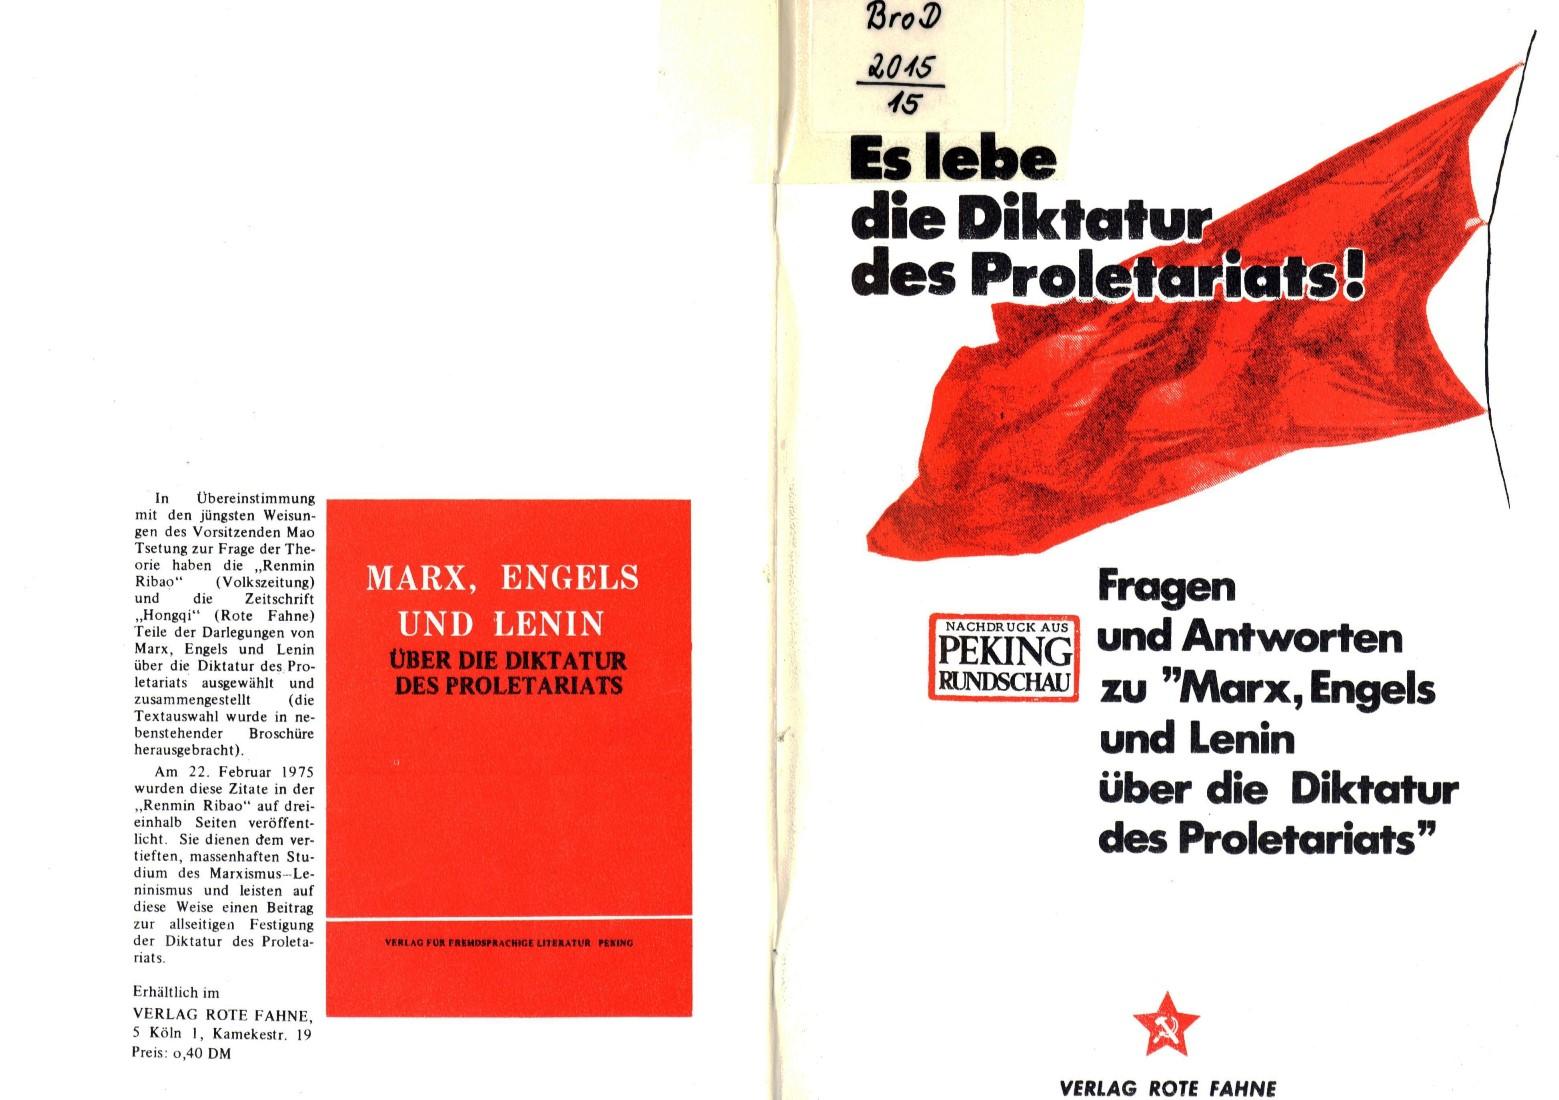 KPDAO_1976_Es_lebe_die_Diktatur_des_Proletariats_01